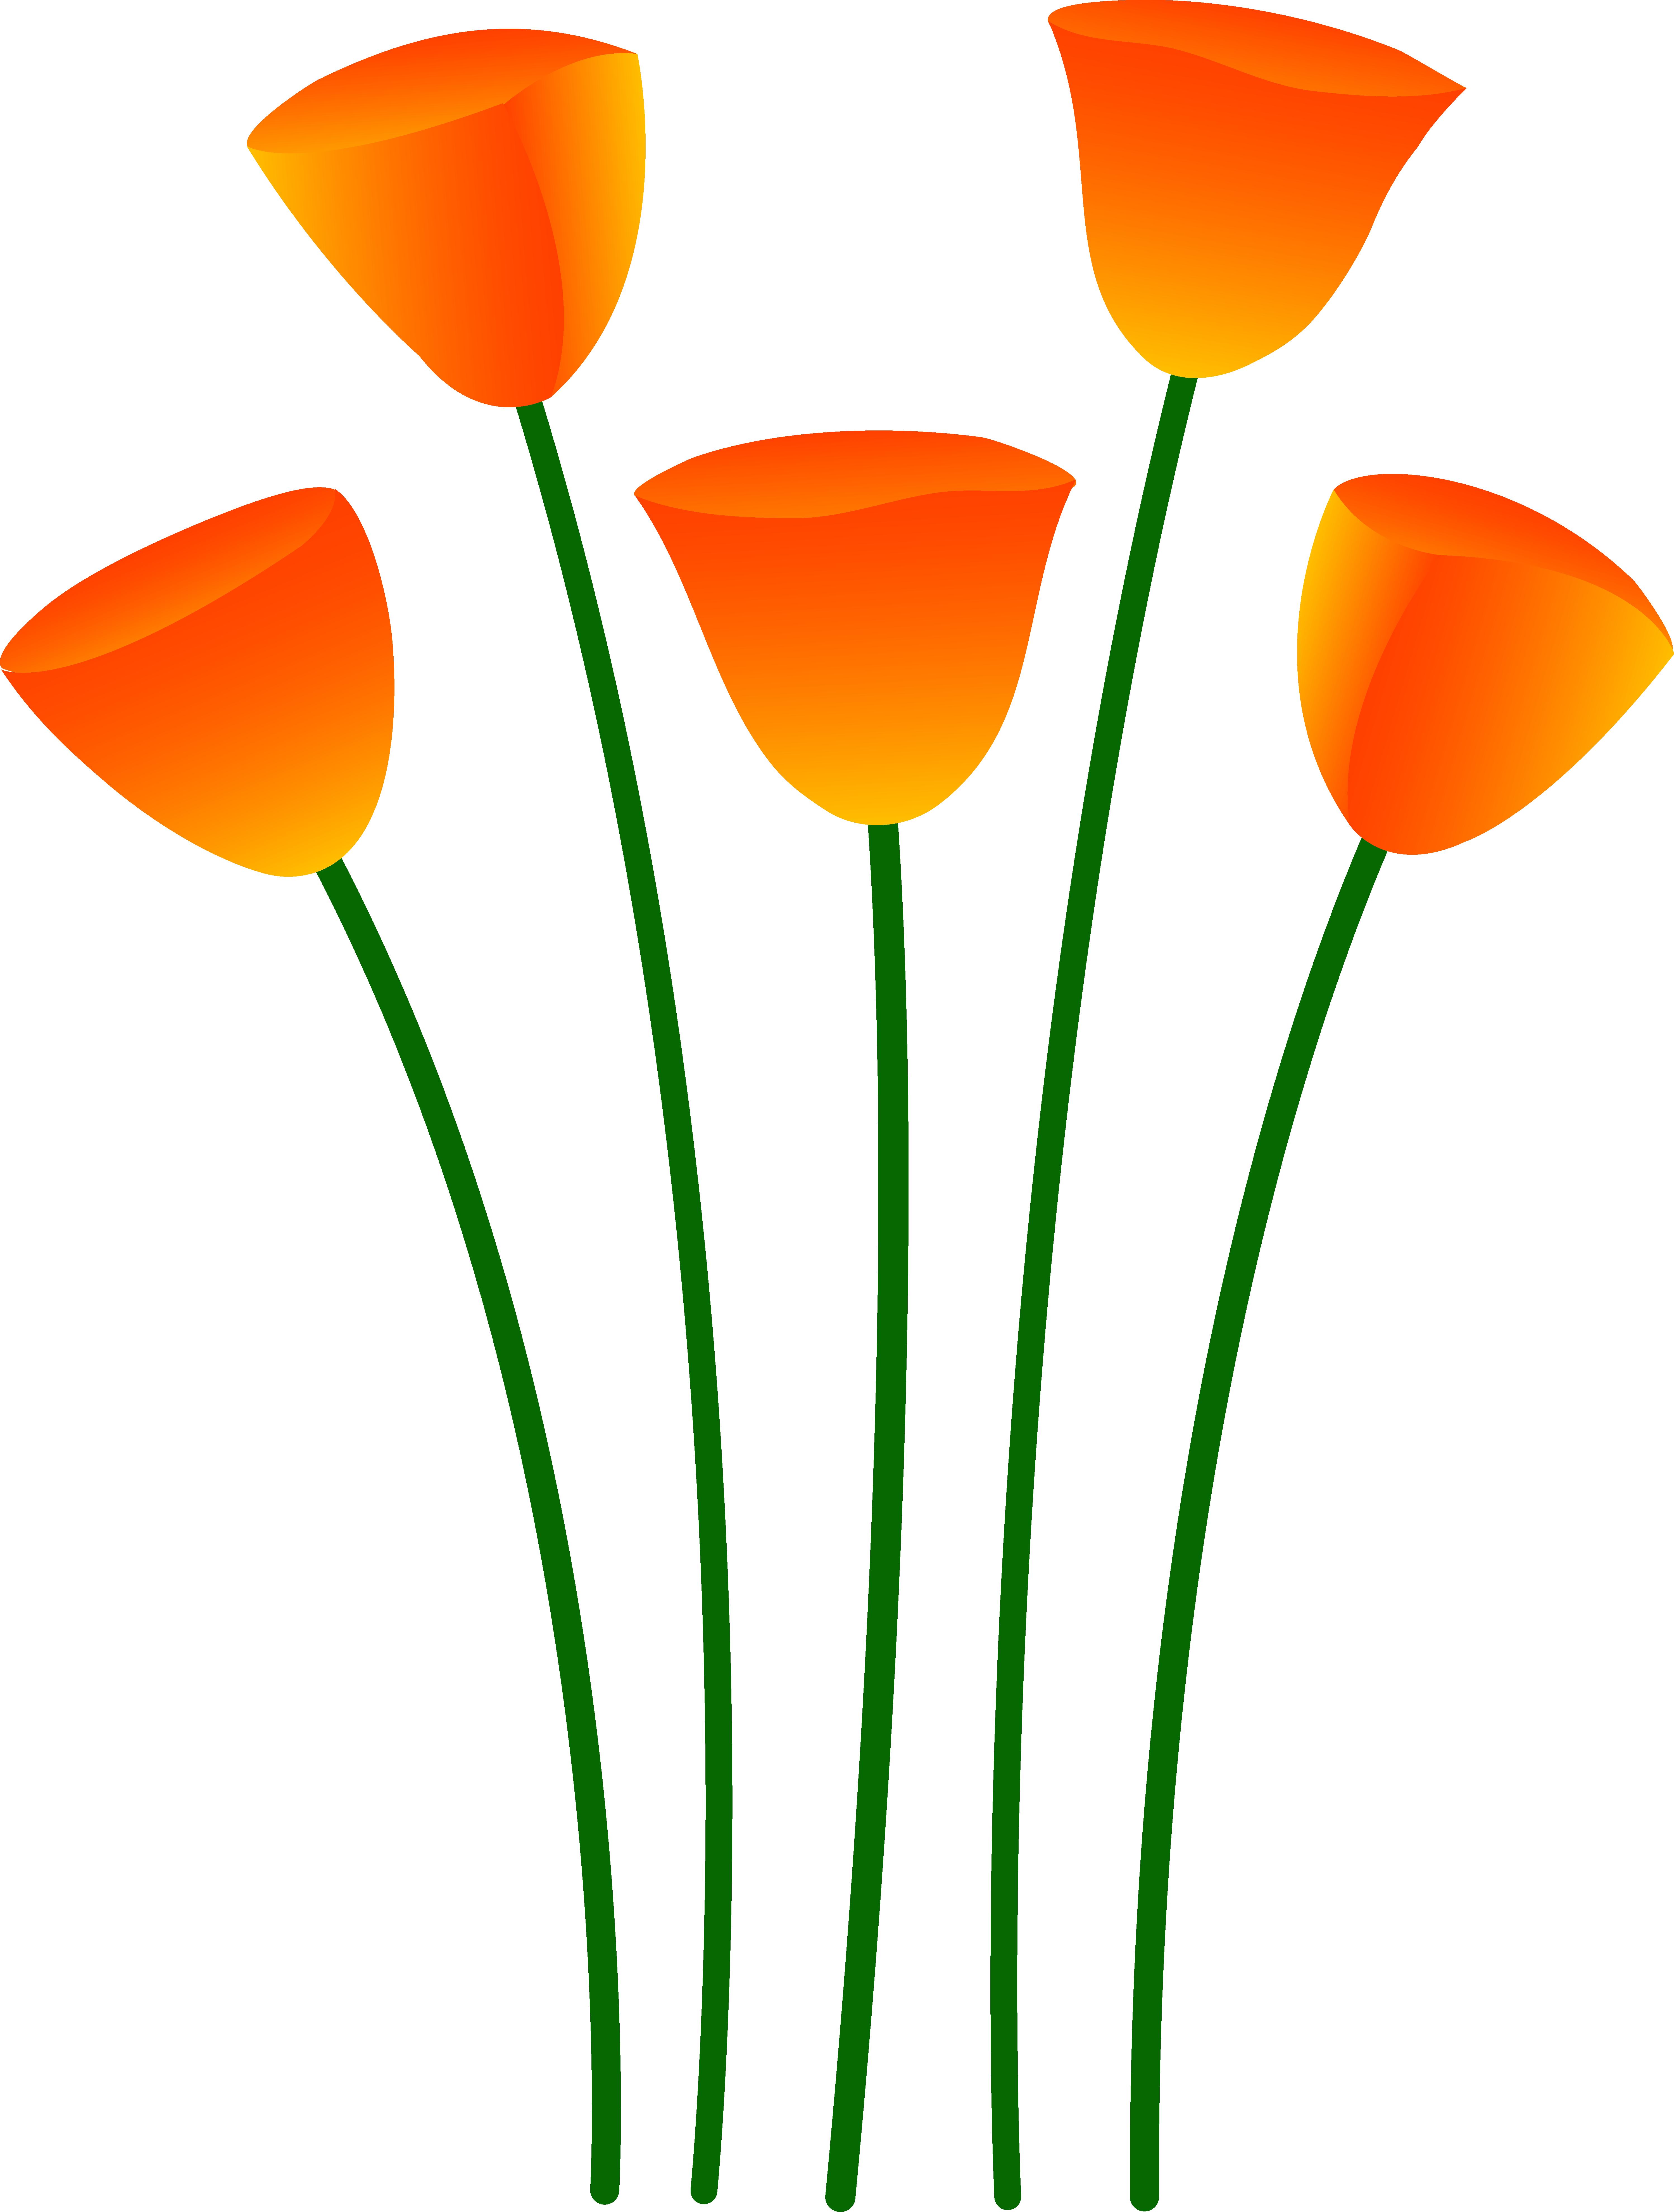 Poppy flower clipart image free library Orange Flower Clipart | Free Download Clip Art | Free Clip Art ... image free library